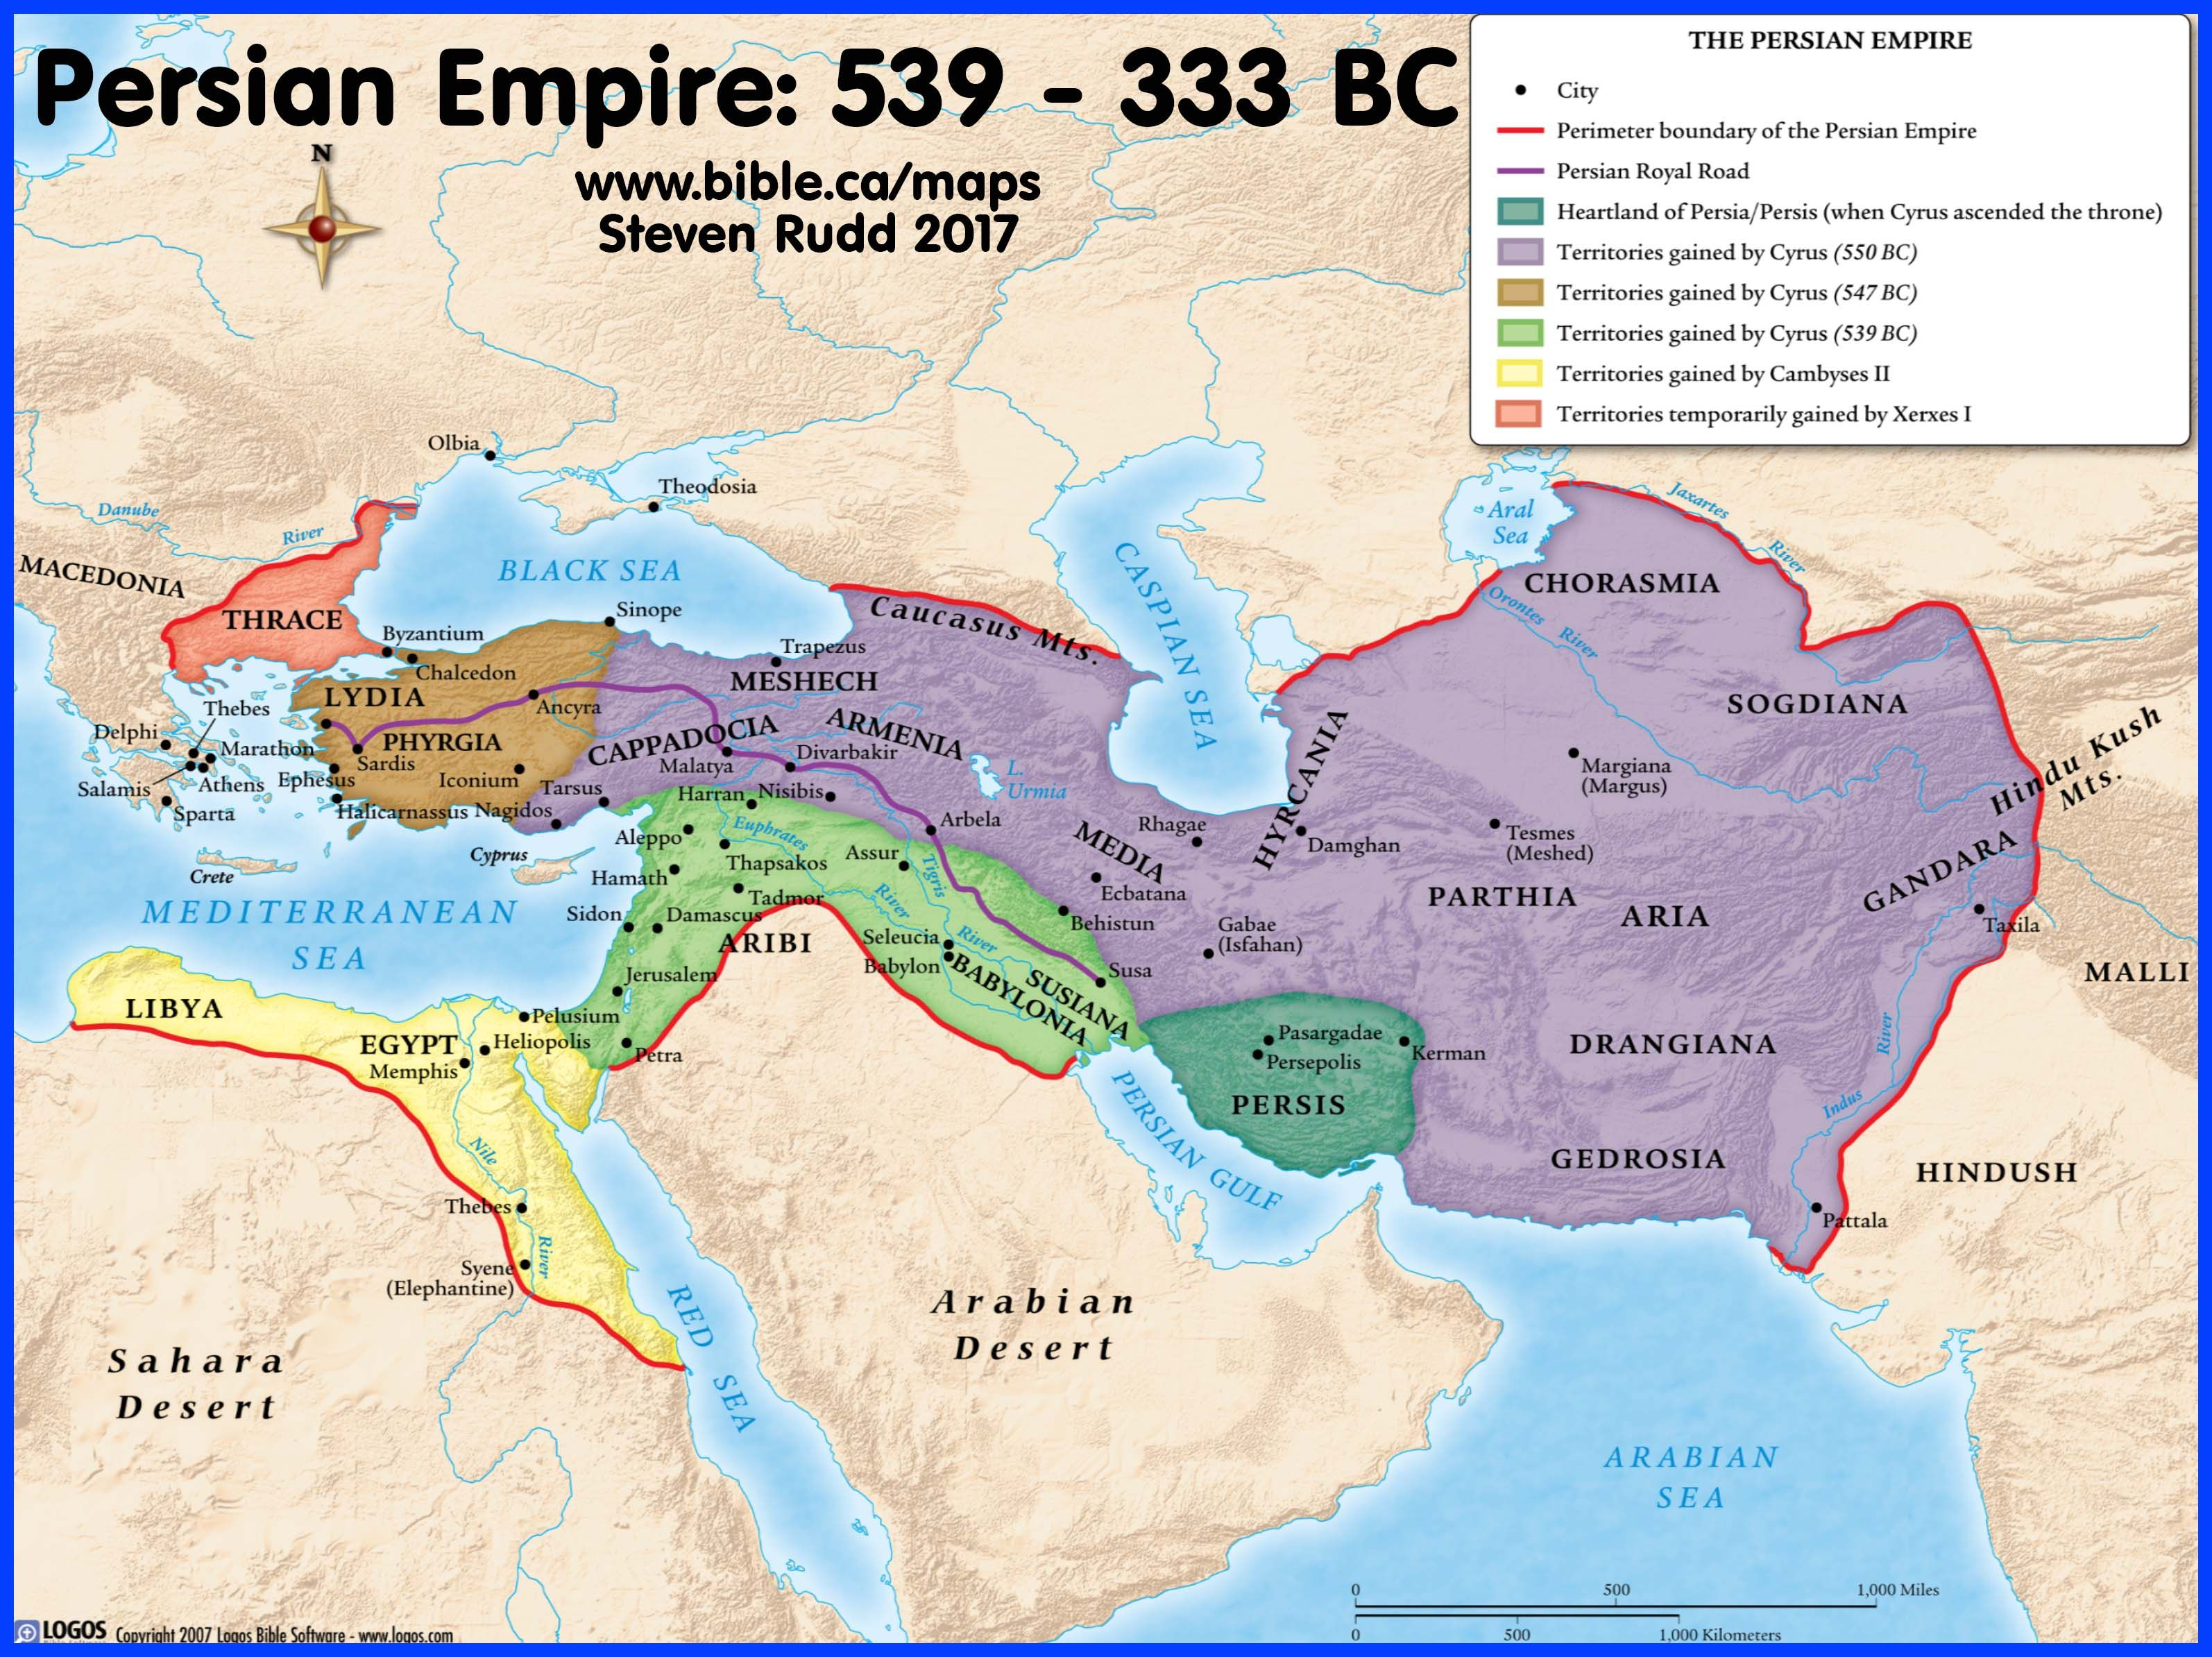 Persian Empire 539 - 333 BC | Bible mapping, Egypt map, Bible on mongols on world map, athena on world map, siam on world map, sparta on world map, assyrians on world map, industrial revolution on world map, battle of waterloo on world map, qin on world map, near east on world map, corinth on world map, egyptian civilization on world map, babylonia on world map, parthenon on world map, jerusalem on world map, spain on world map, zhou dynasty on world map, buddhism on world map, bactria on world map, persia on world map, religion on world map,